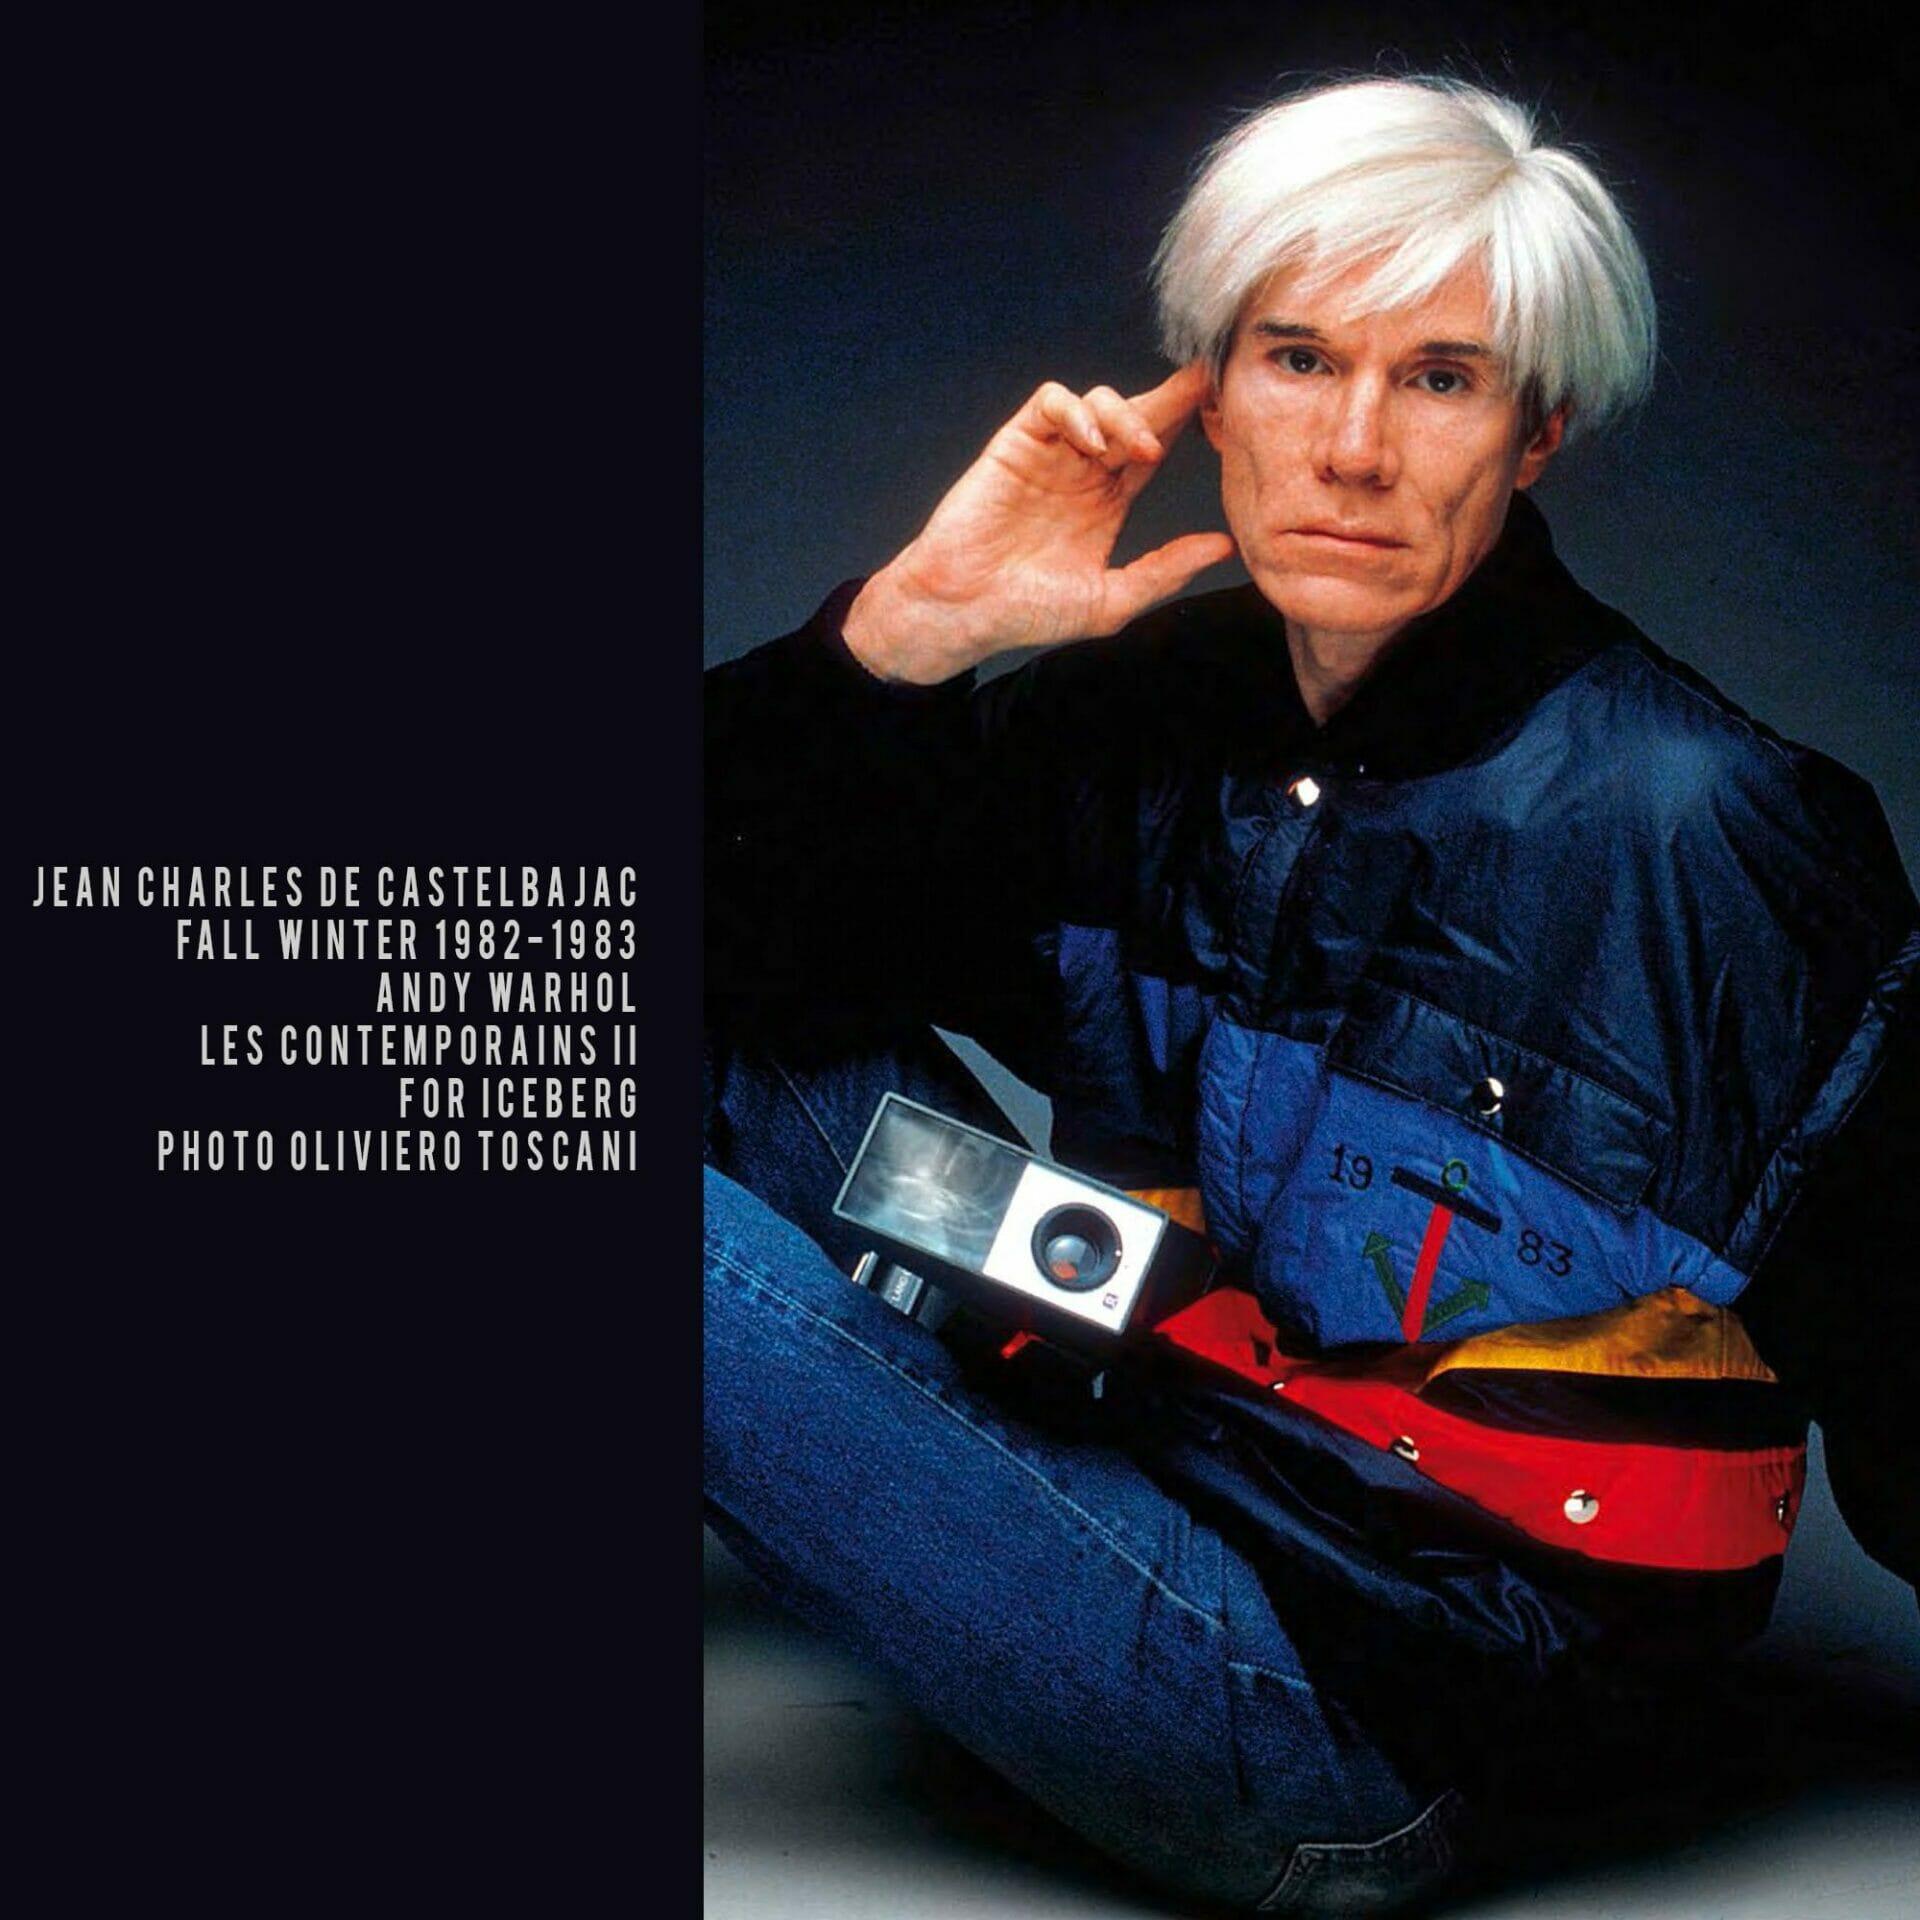 JC de Castelbajac for ICEBERG 1982 Andy Warhol. RUNWAY MAGAZINE ® Collections. RUNWAY NOW / RUNWAY NEW